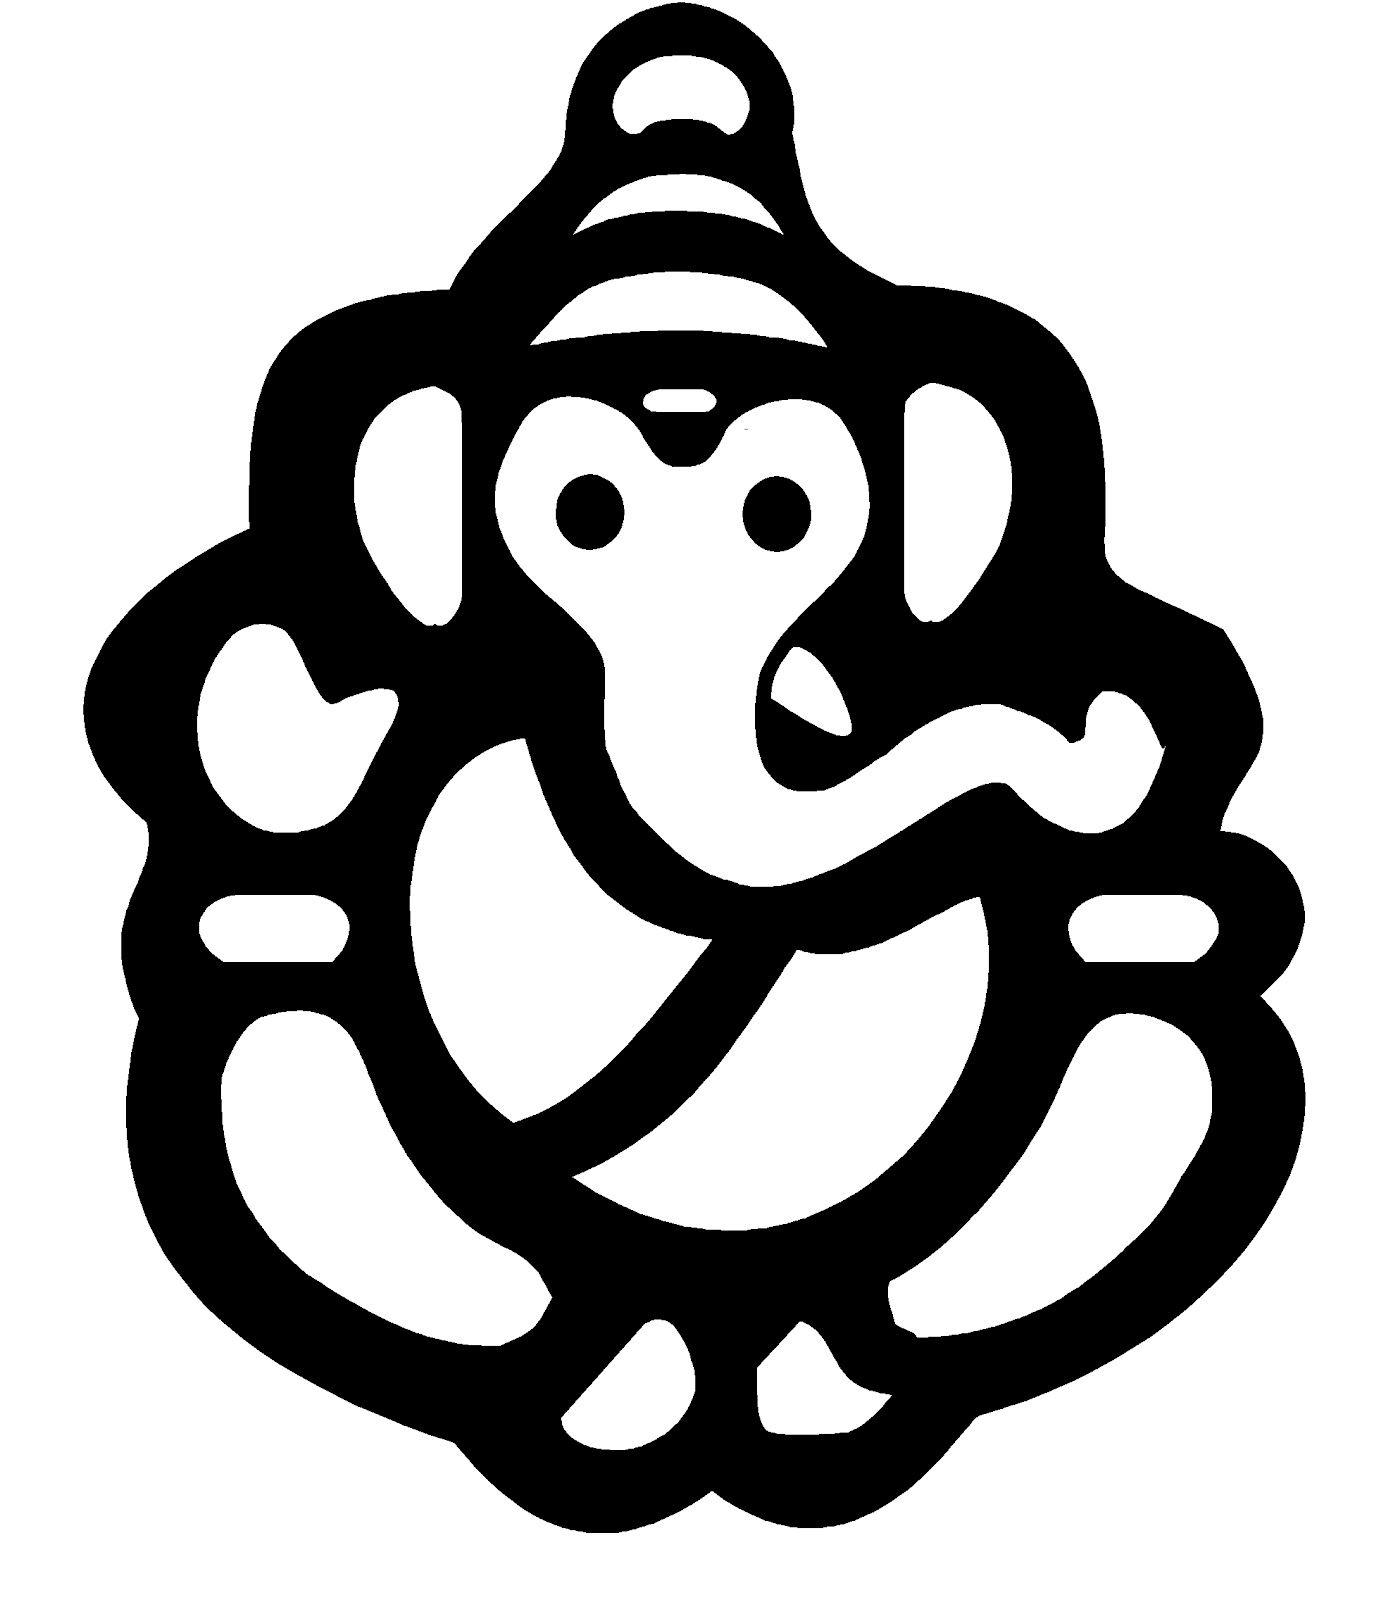 Ganpati clipart file image freeuse Ganesh Vector - ClipArt Best | just in 2019 | Ganesh images, Ganesh ... image freeuse